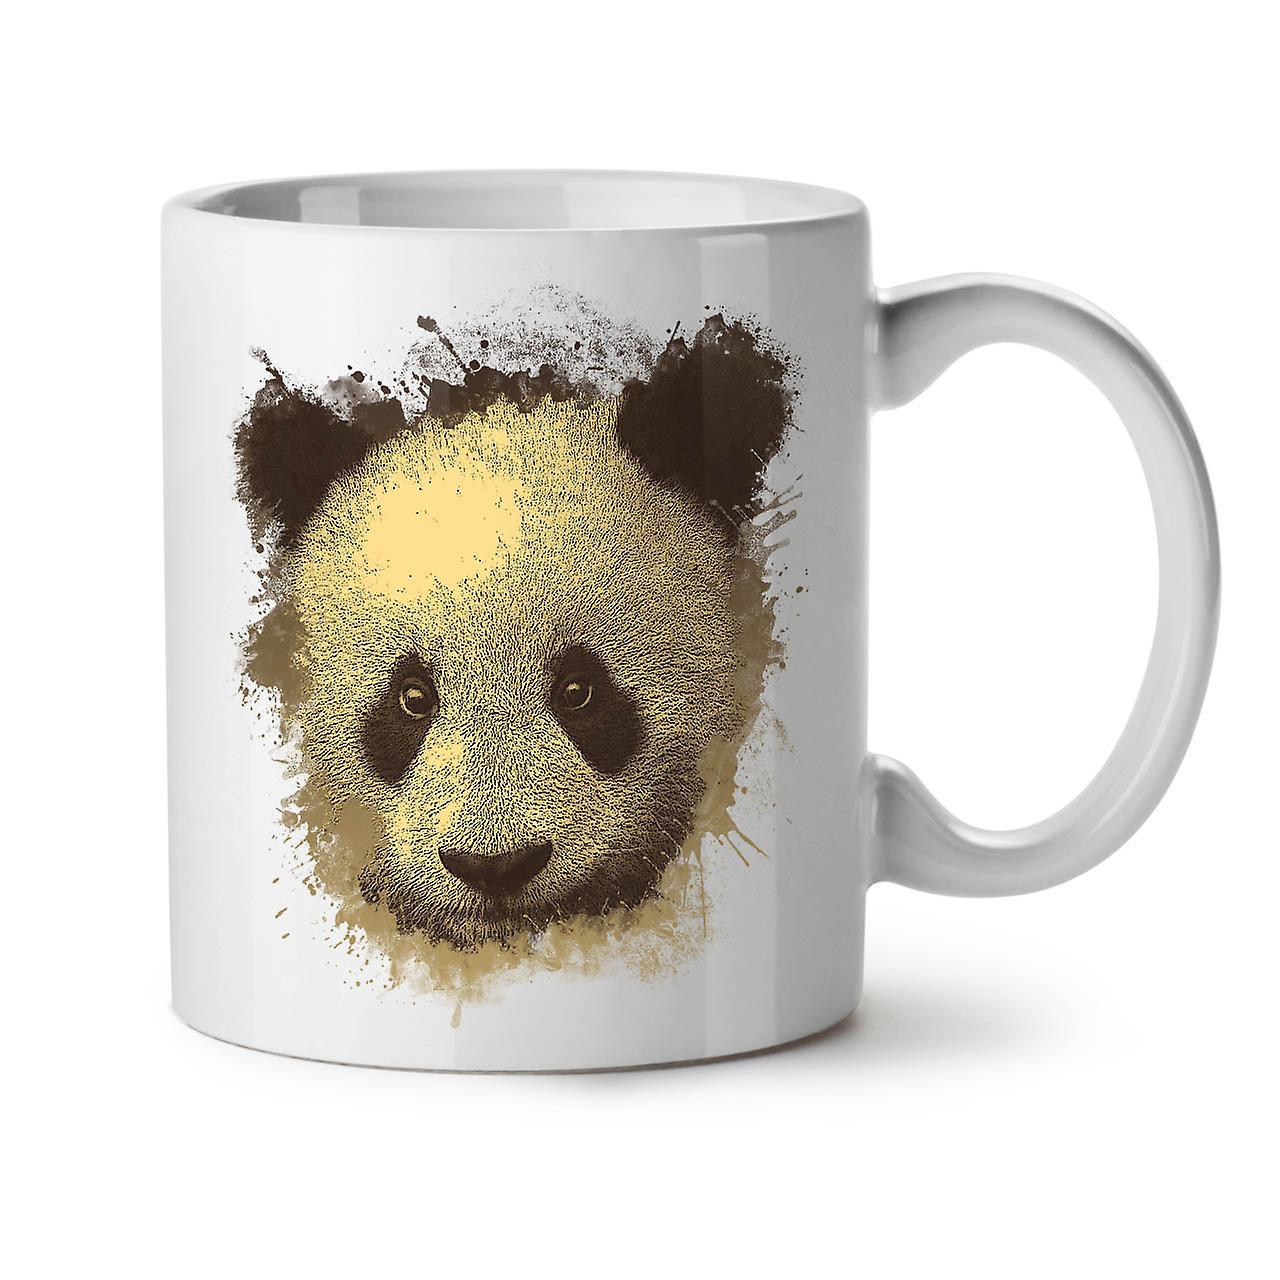 Blanc 11 Café Animal Céramique Bear Mignon Nouveau Thé Tasse Panda OzWellcoda XZOuwkilPT